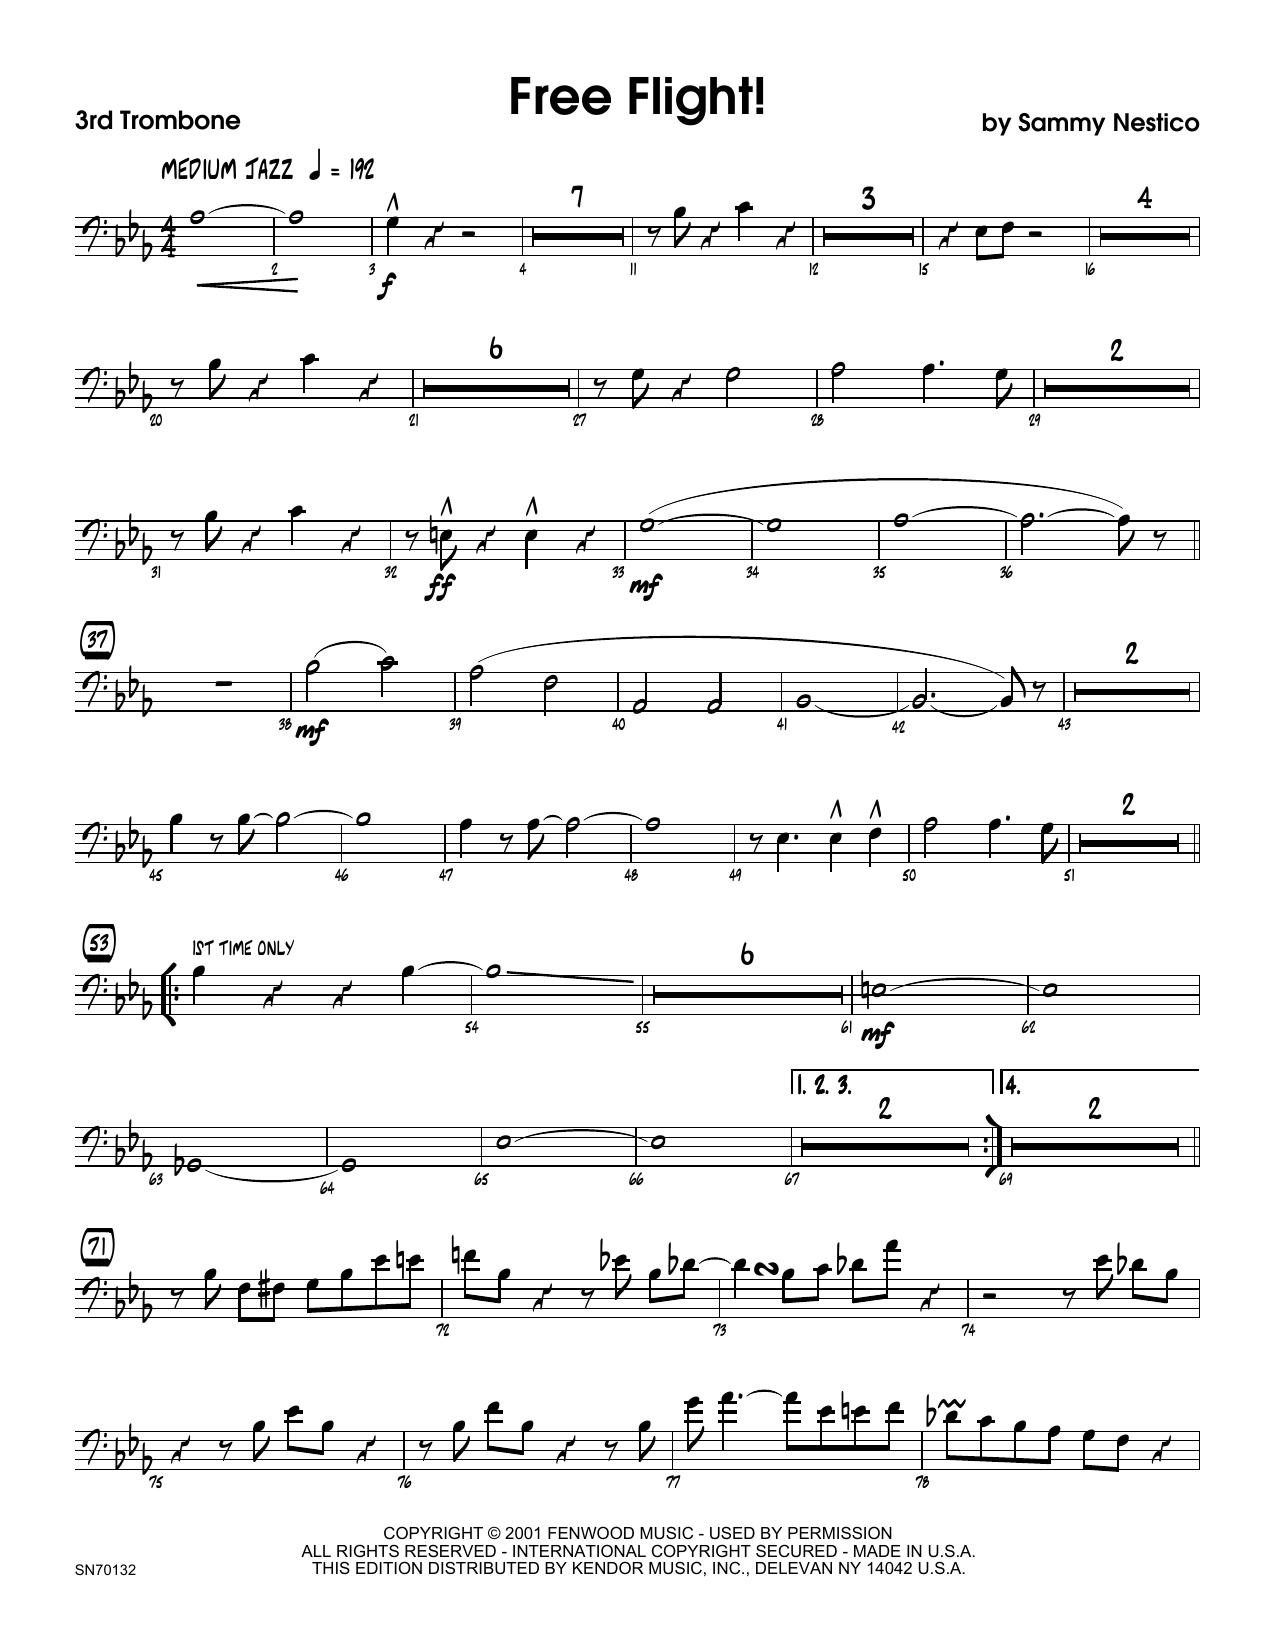 Free Flight! - 3rd Trombone Sheet Music